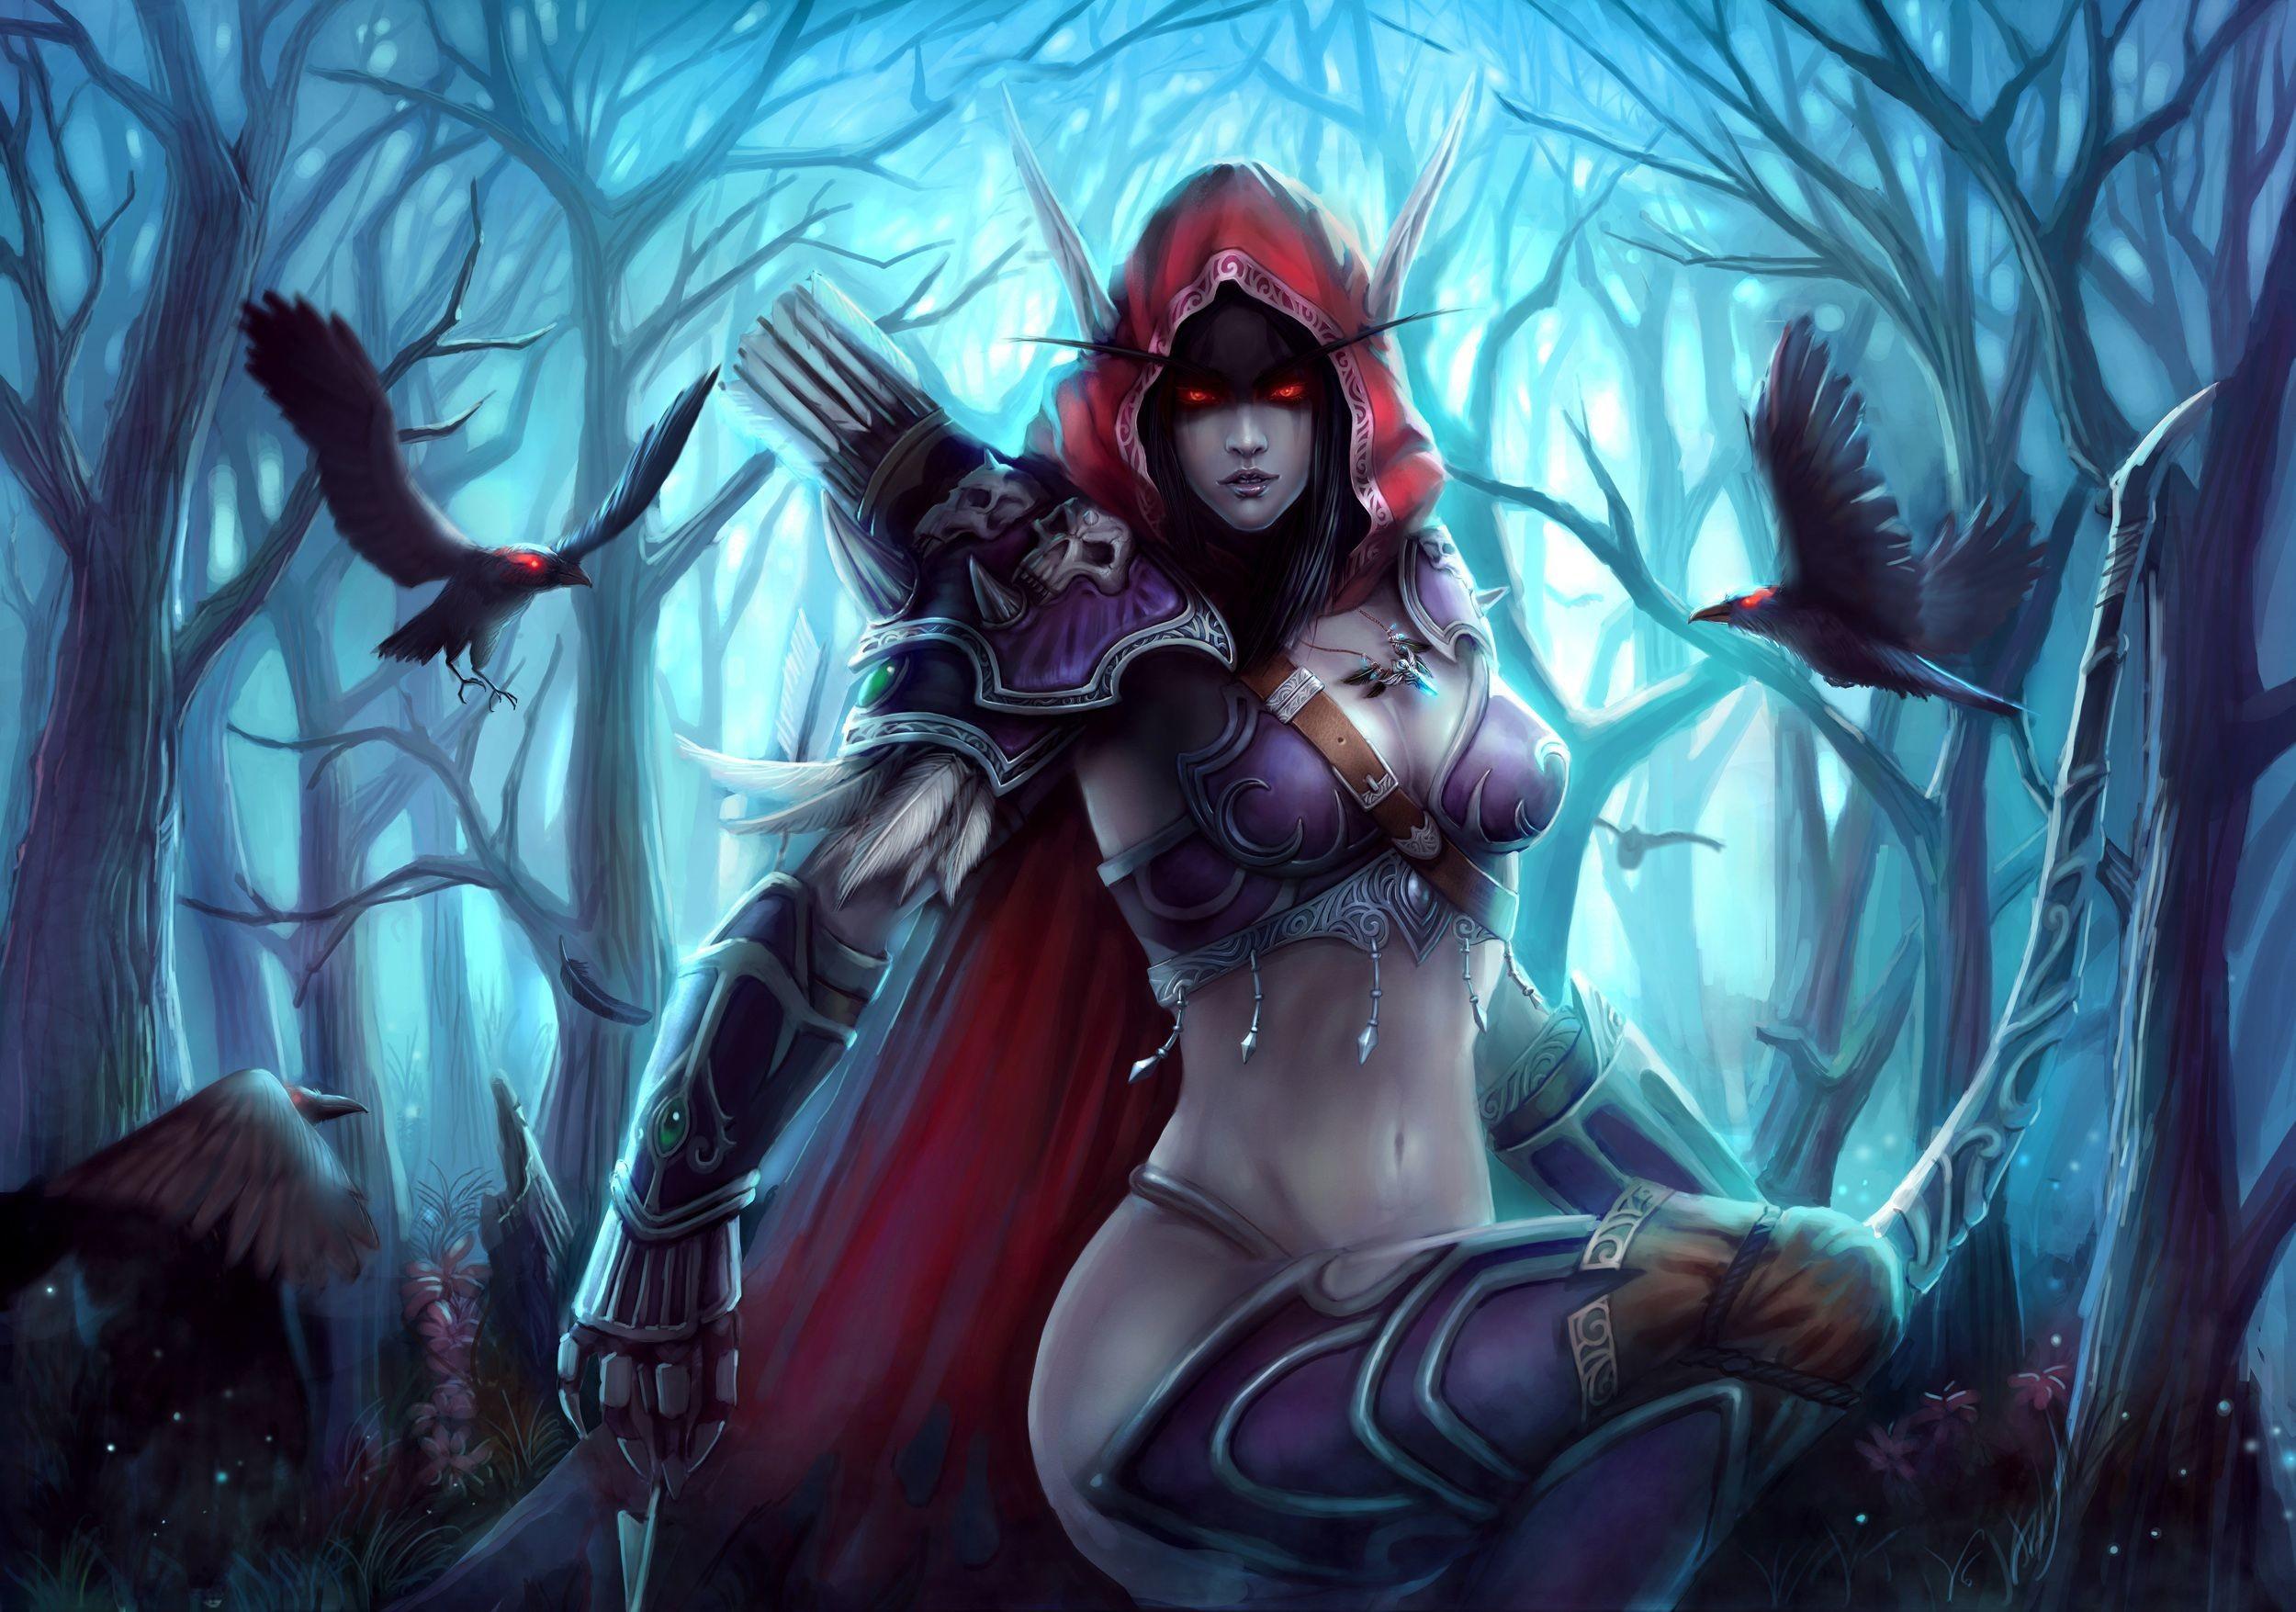 Video Game – World Of Warcraft Bakgrund. Ladda ner! Next Wallpaper ·  FöregÃ¥ende bakgrundsbild. Sylvanas Windrunner